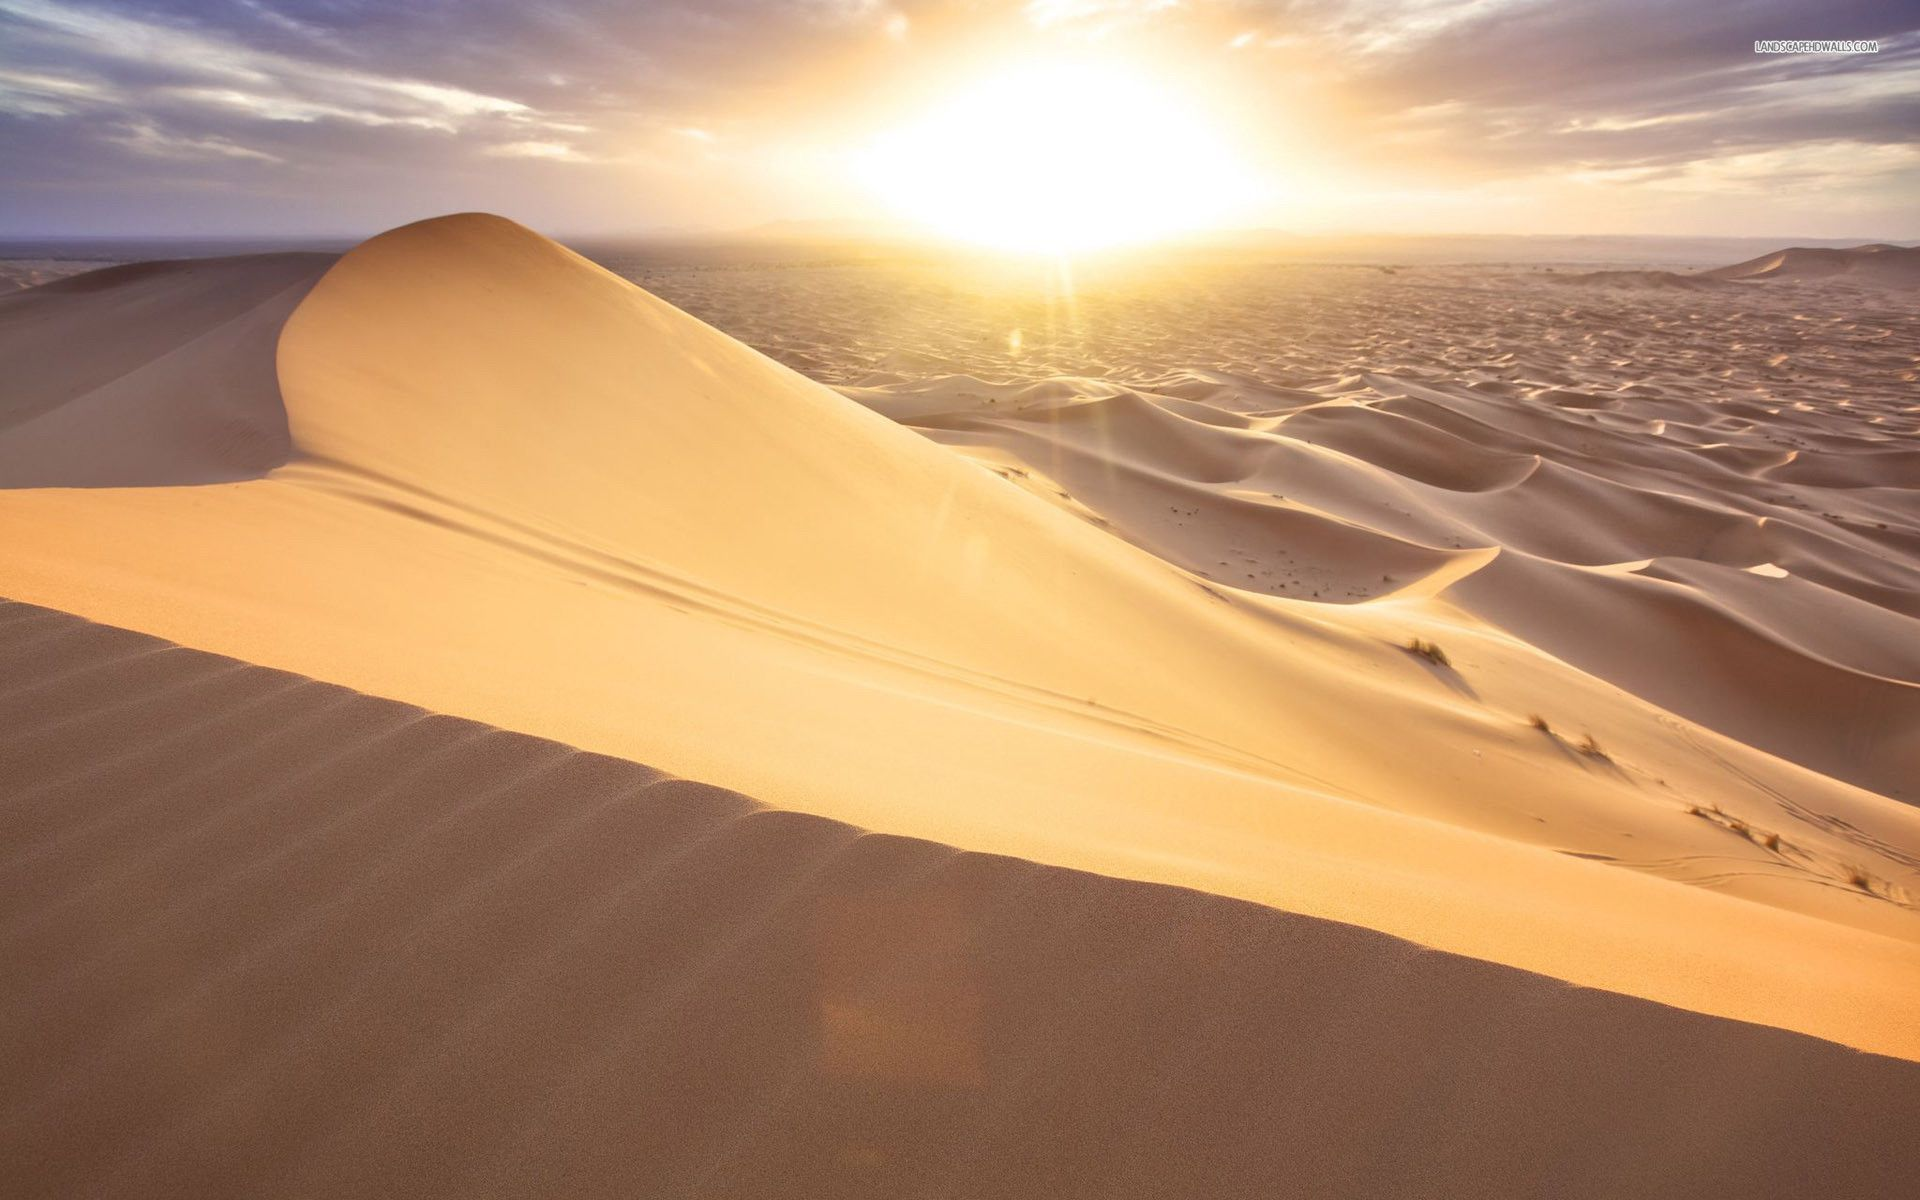 Image Result For Sand Dunes Lock Screen Wallpaper Mobile The Desktop